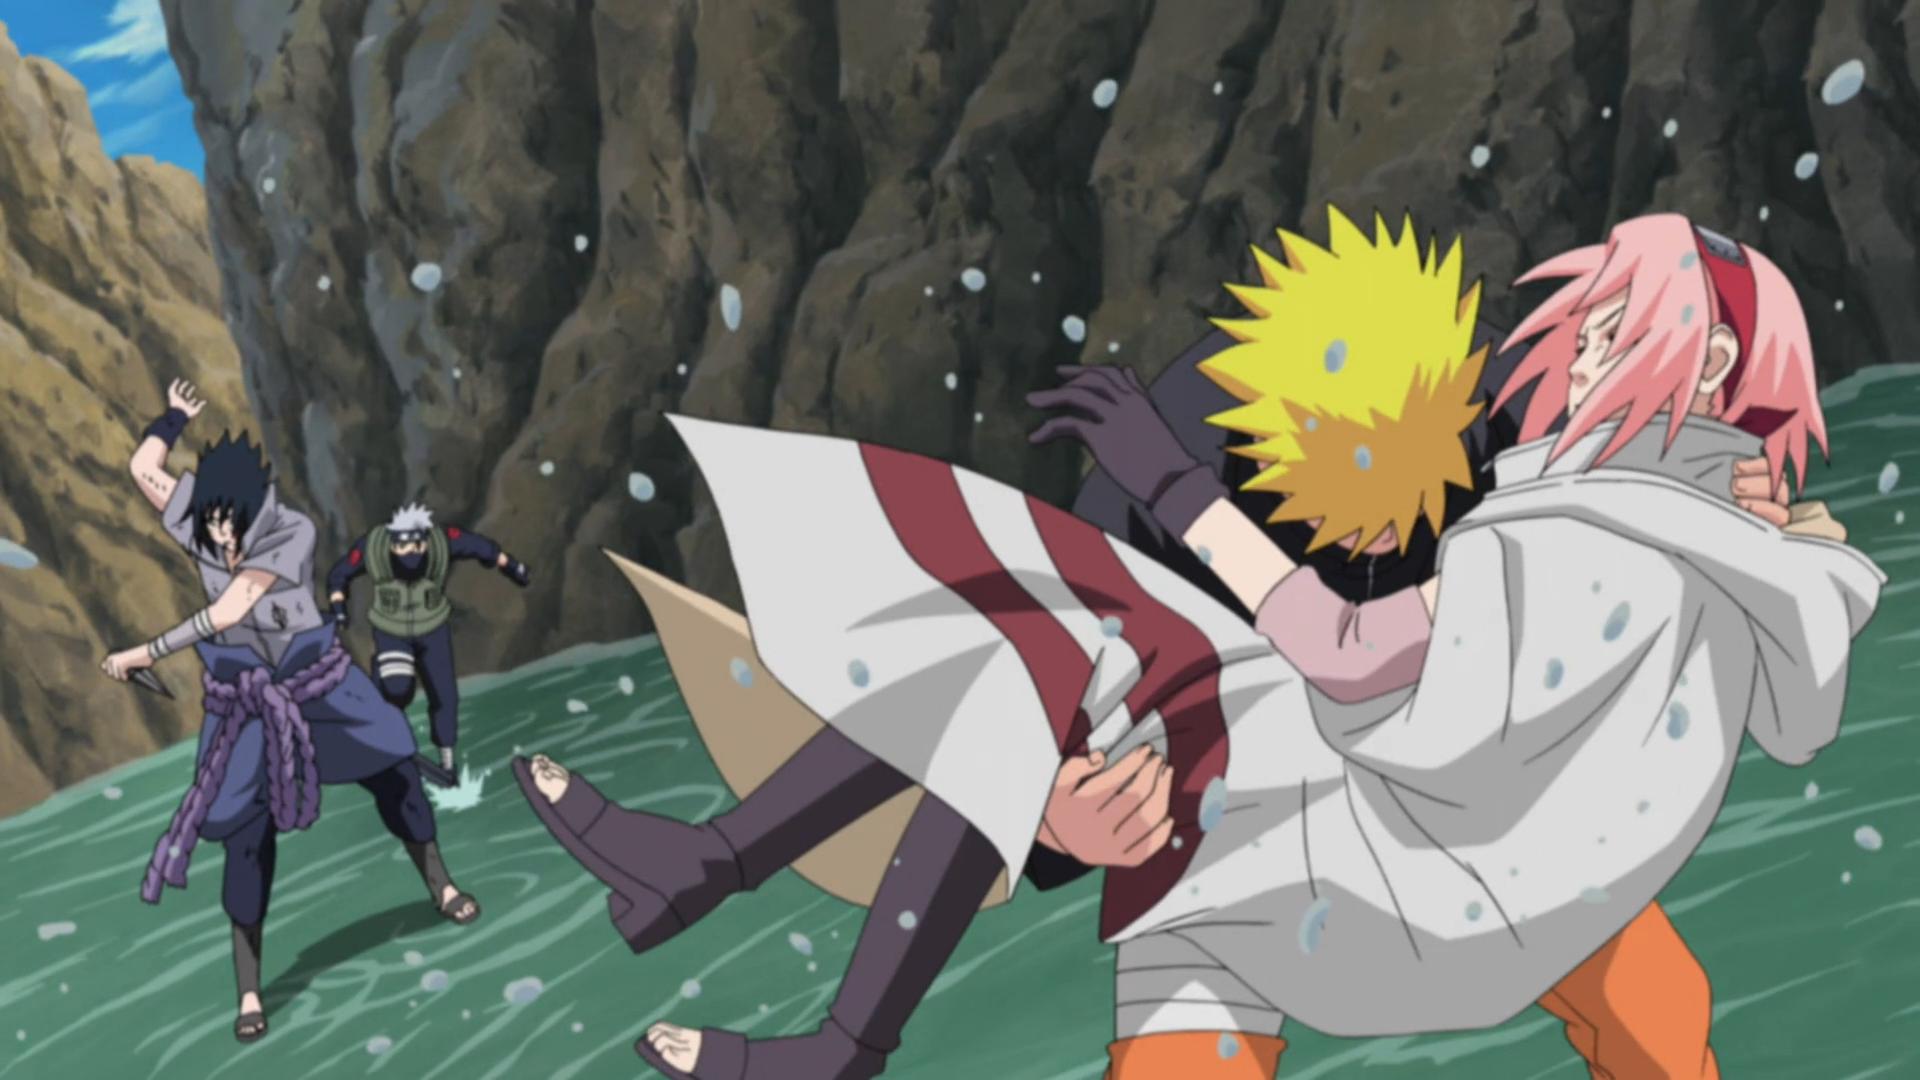 Team 7 - Naruto vs. Sasuke OVA by CartoonPerson on DeviantArt